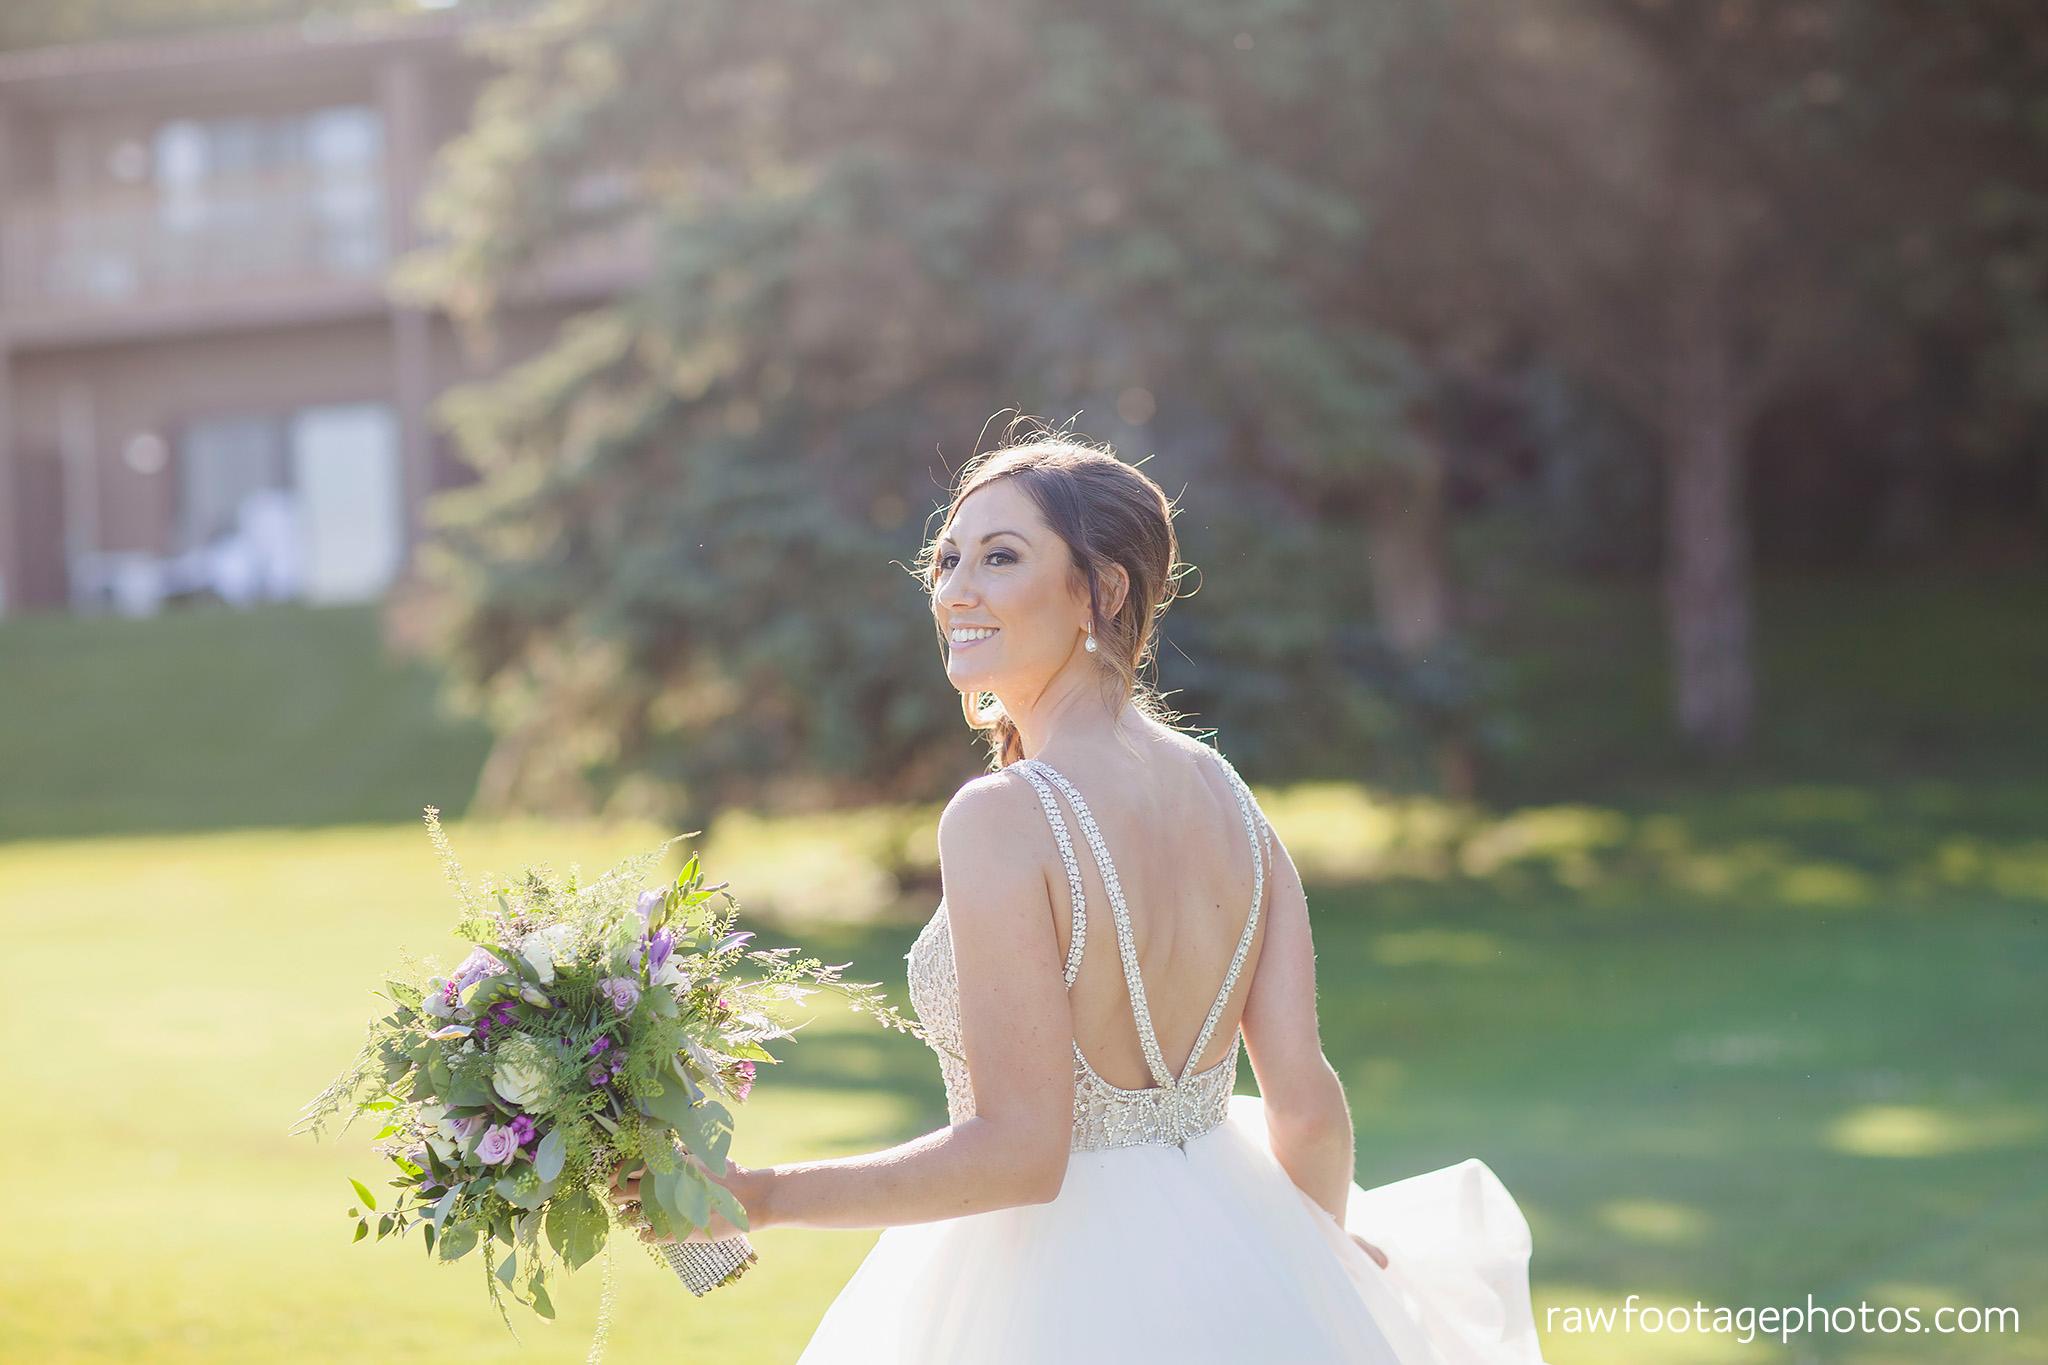 london_ontario_wedding_photographer-grand_bend_wedding_photographer-oakwood_resort_wedding-beach_wedding-sunset_wedding-raw_footage_photography055.jpg